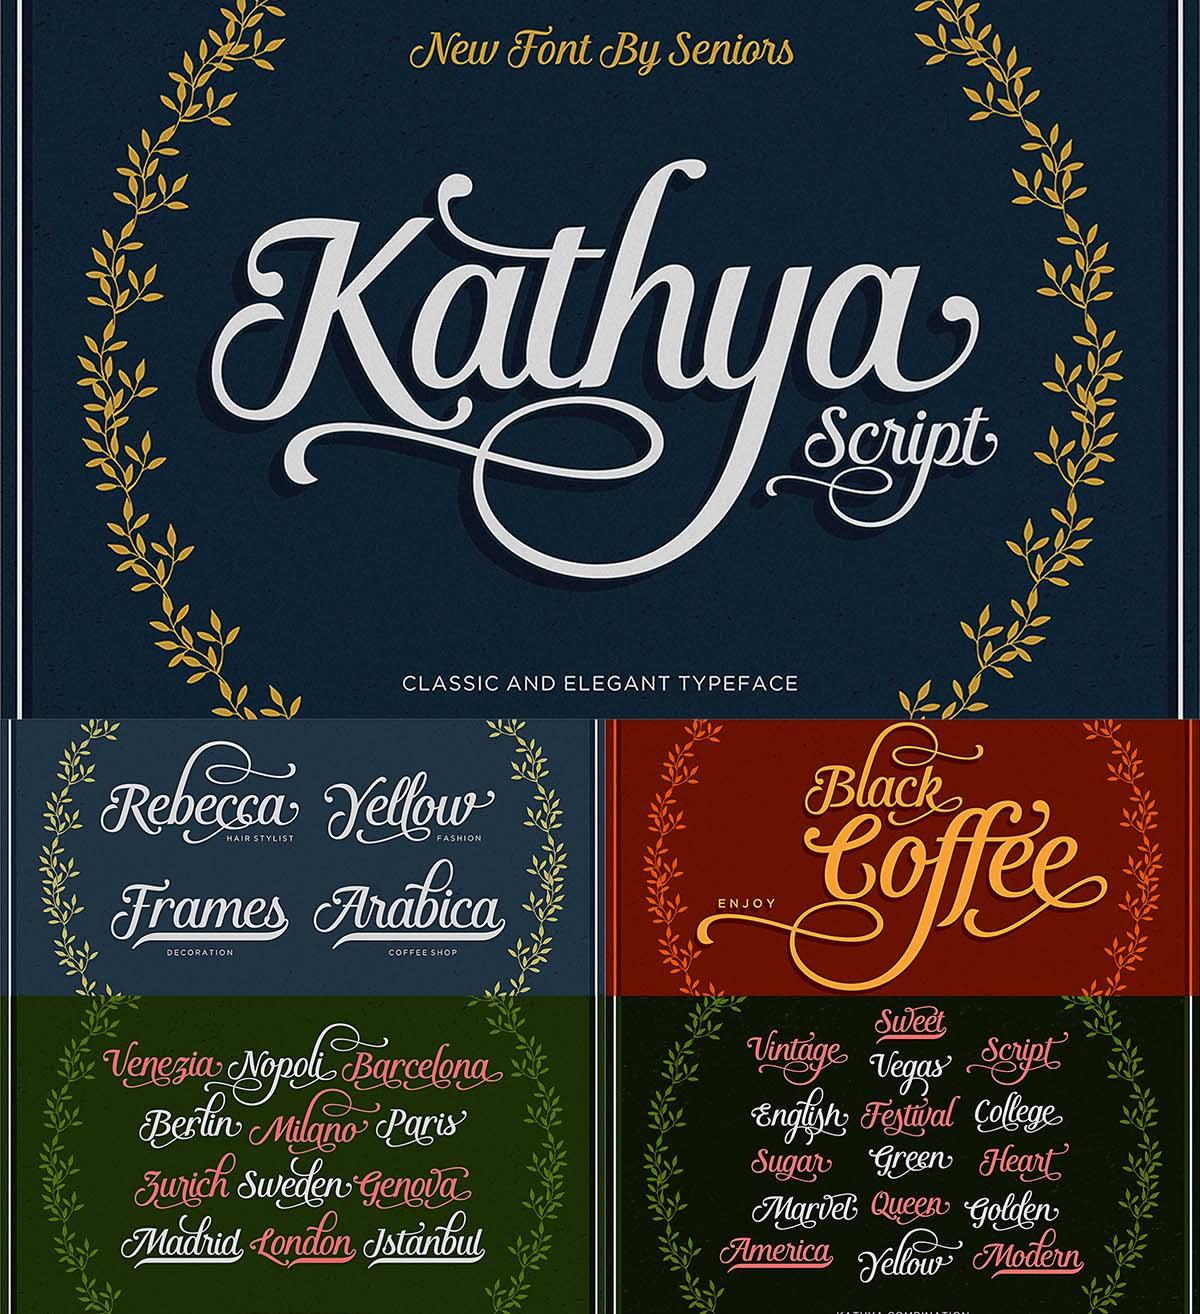 Kathya script calligraphy